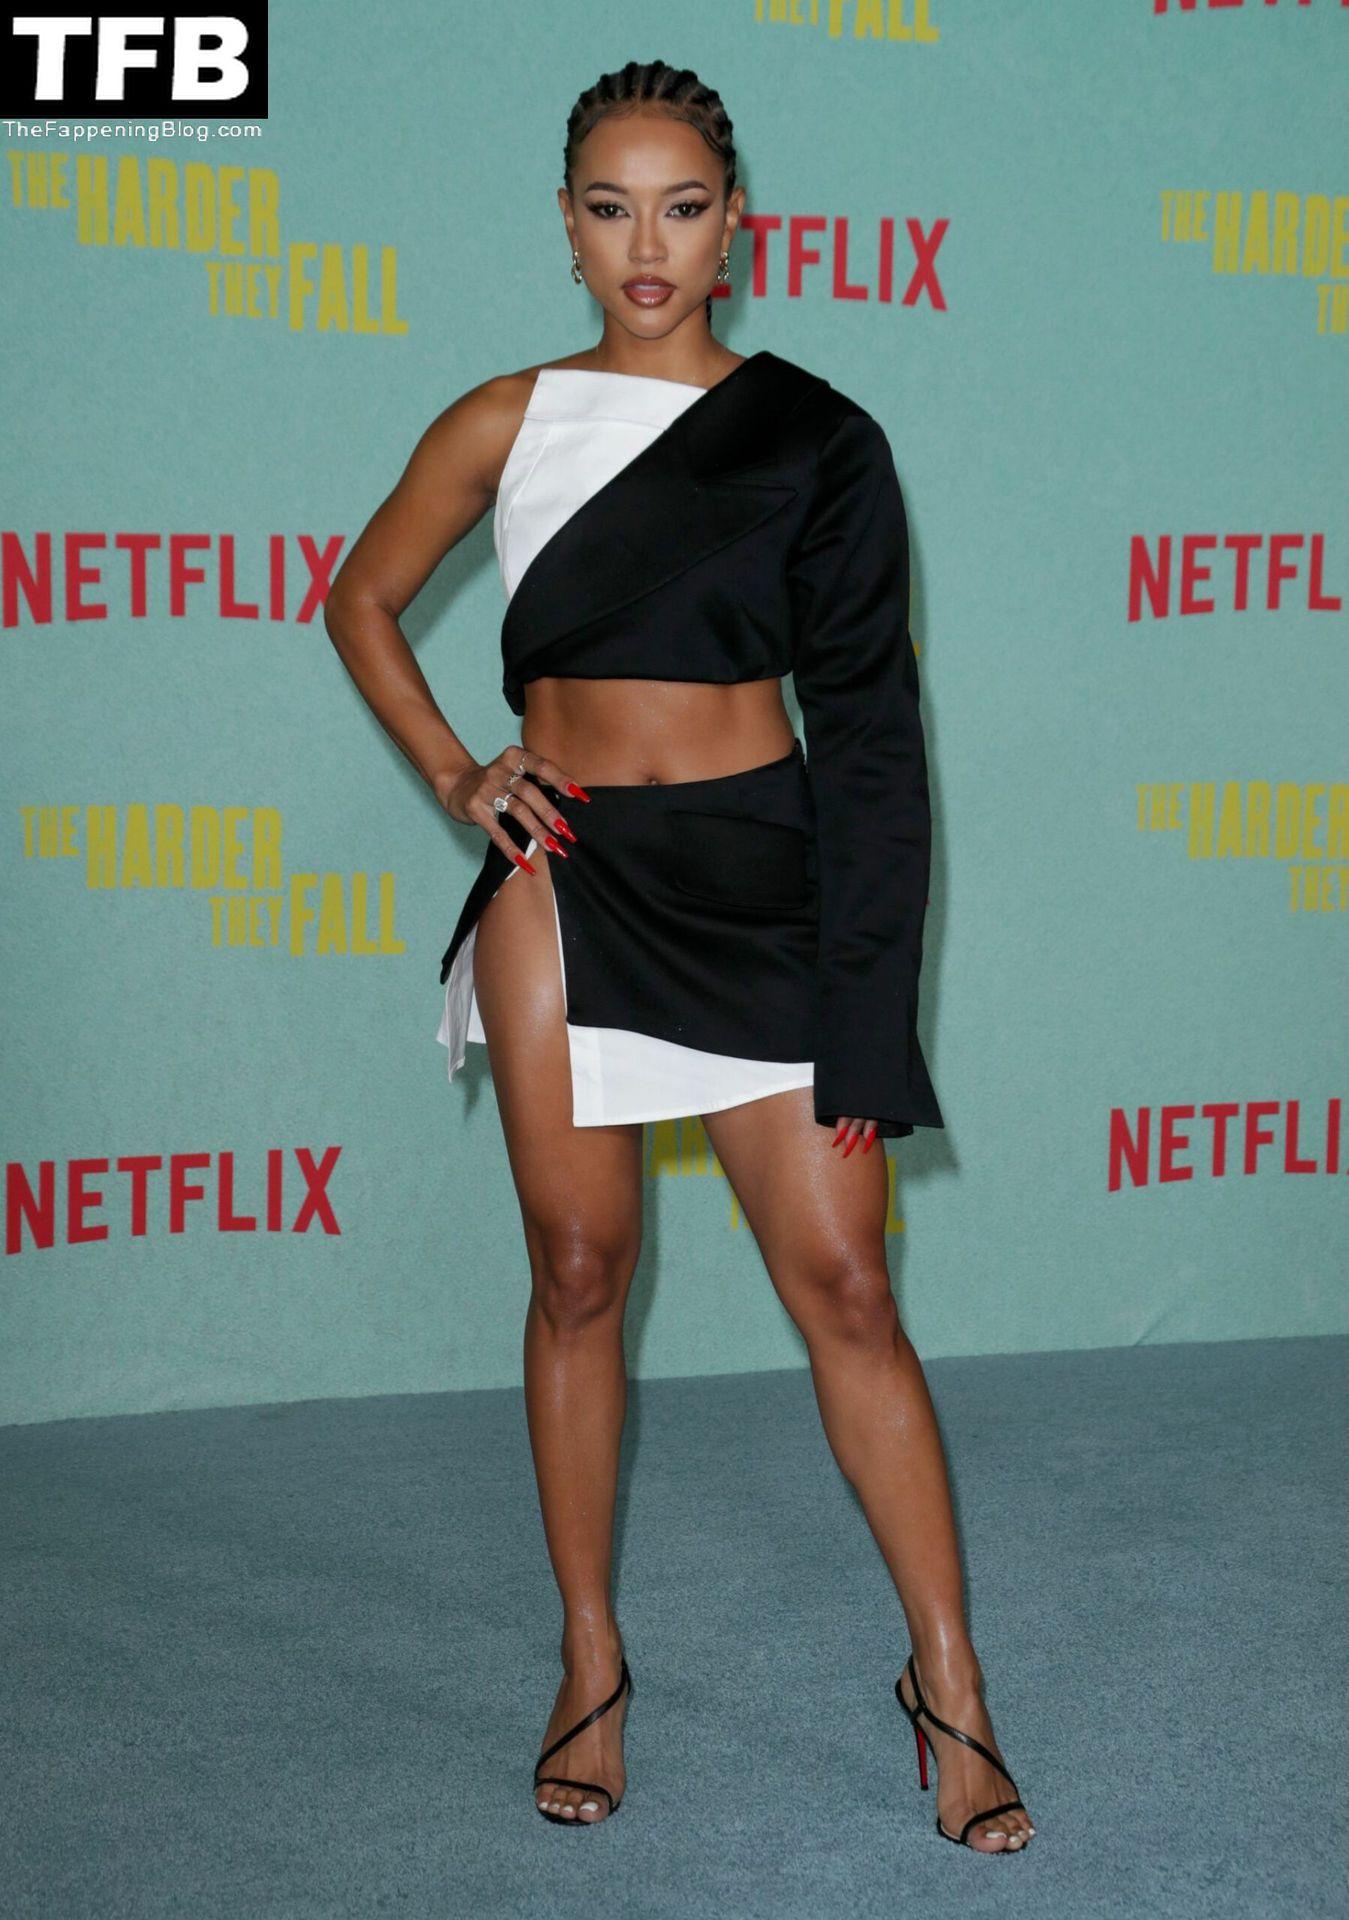 Karrueche-Tran-Sexy-Legs-Upskirt-The-Fappening-Blog-14.jpg